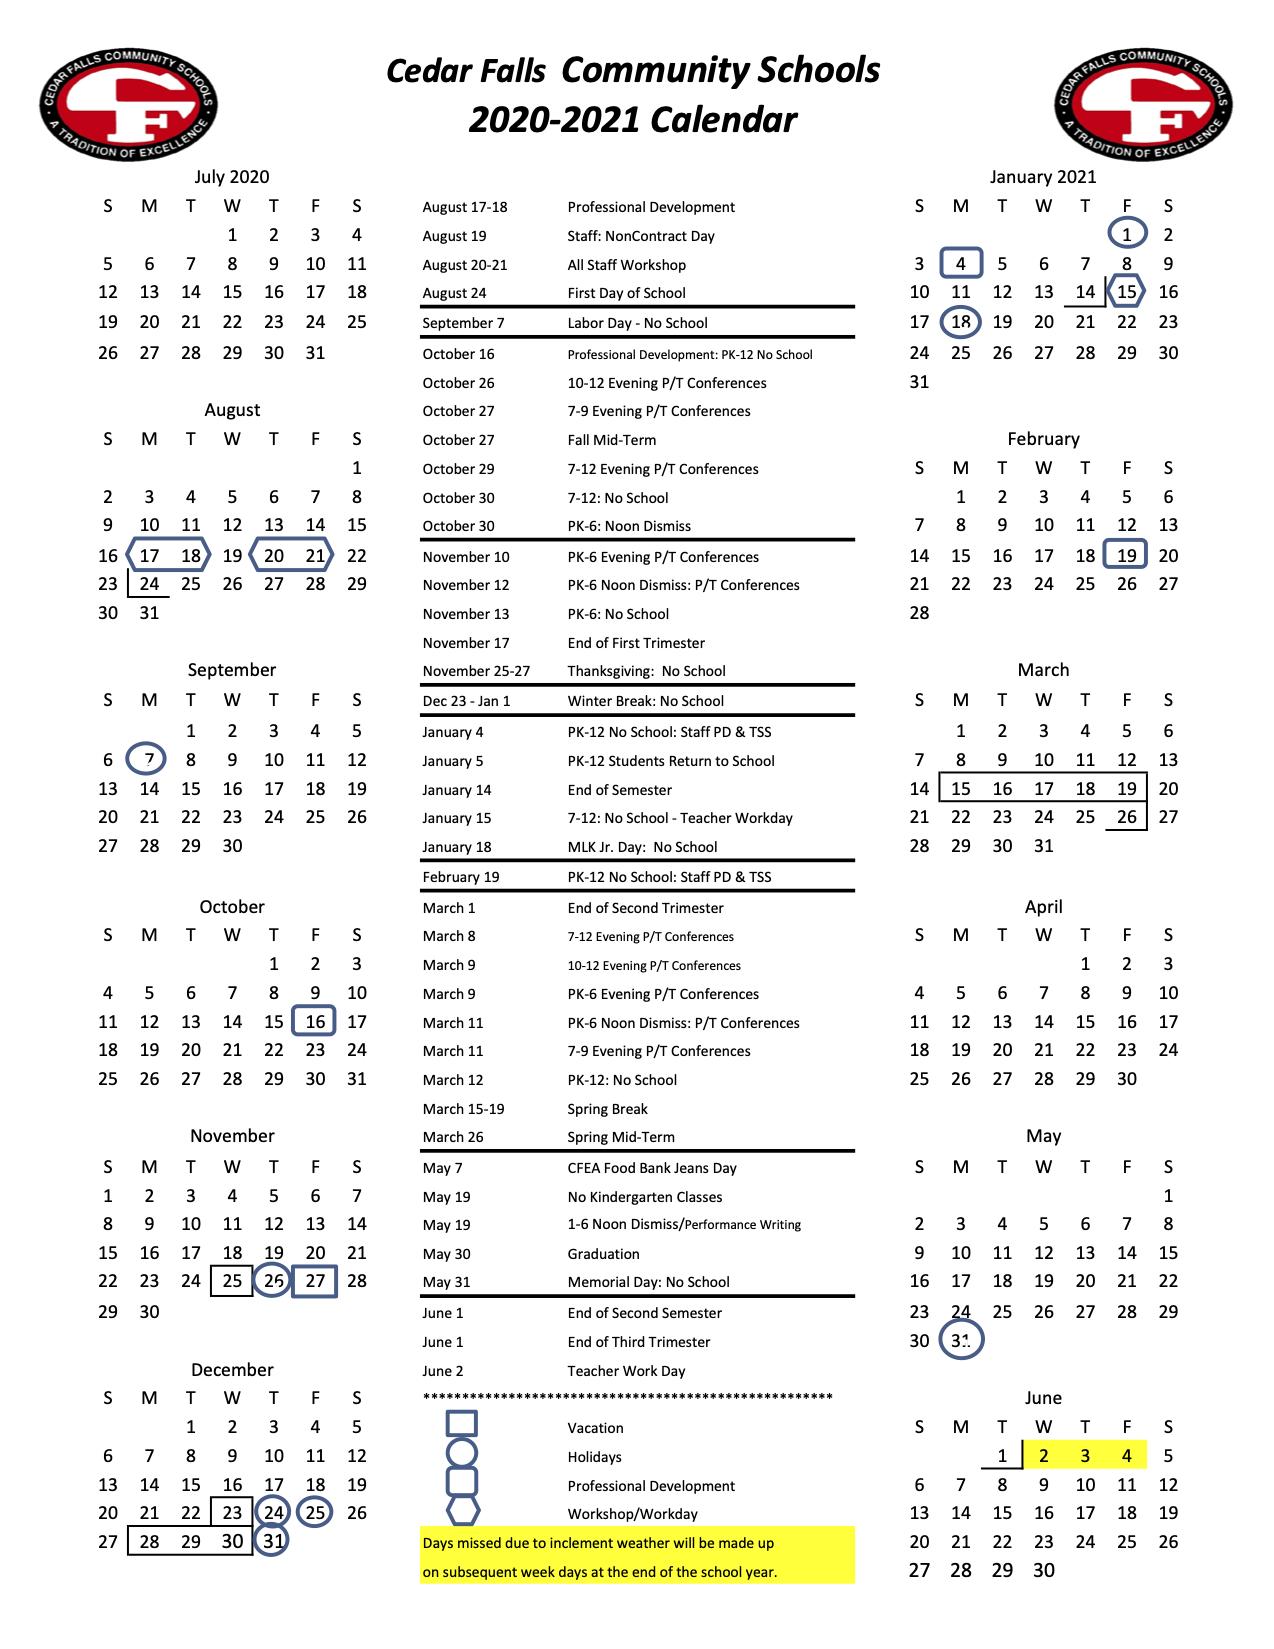 Cedar Falls Community School District In Cedar Rapids School District Calendar